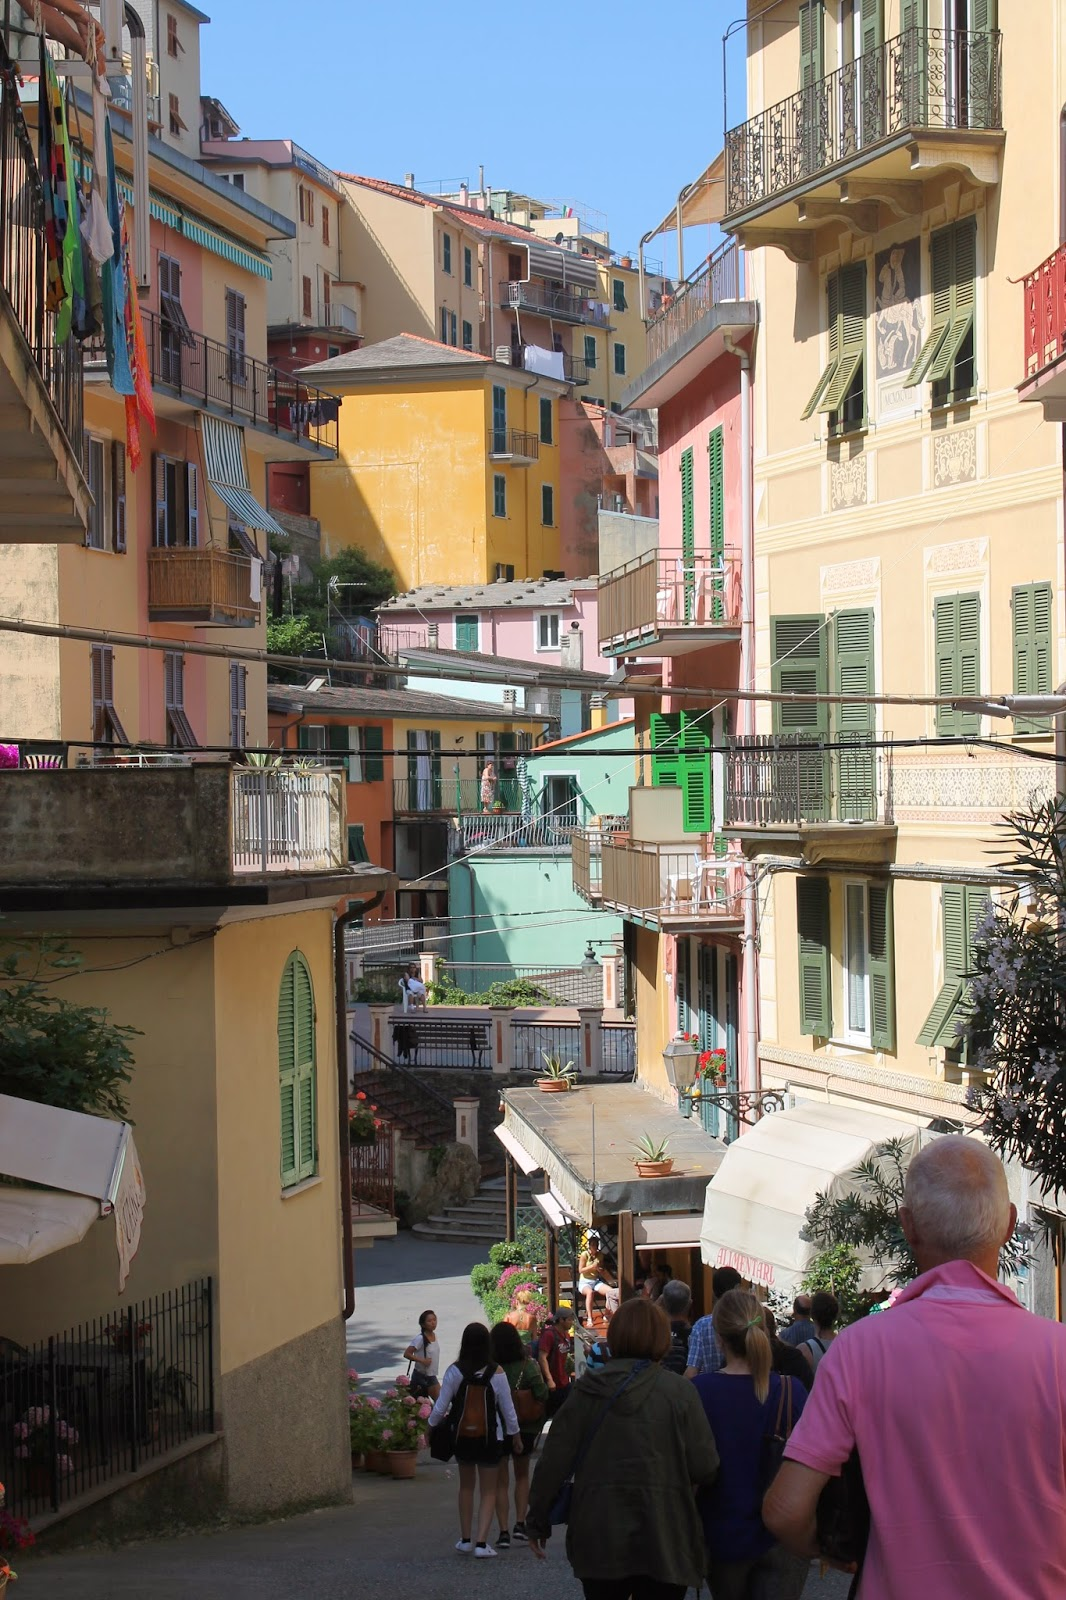 main street, Manarola, Cinqe Terre, Italy